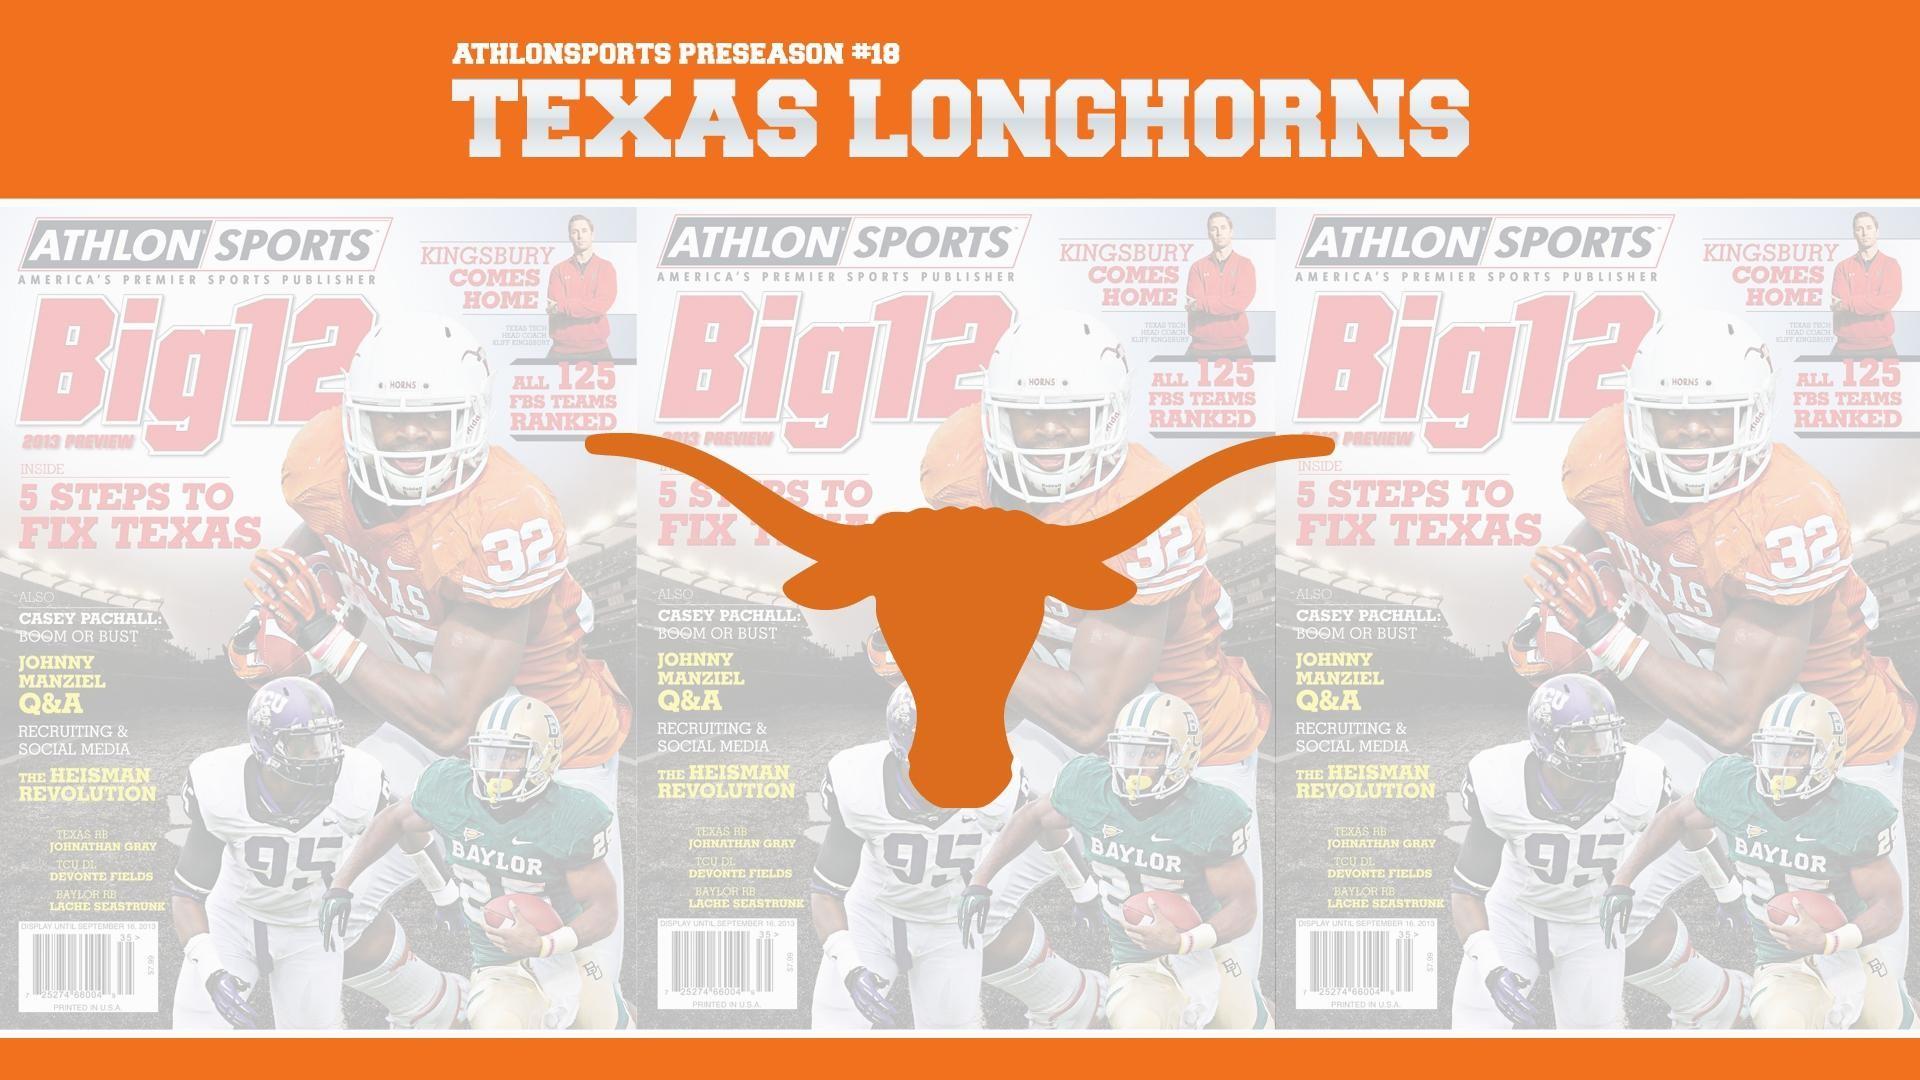 wallpaper.wiki-HD-Texas-Longhorns-Football-Photos-PIC-